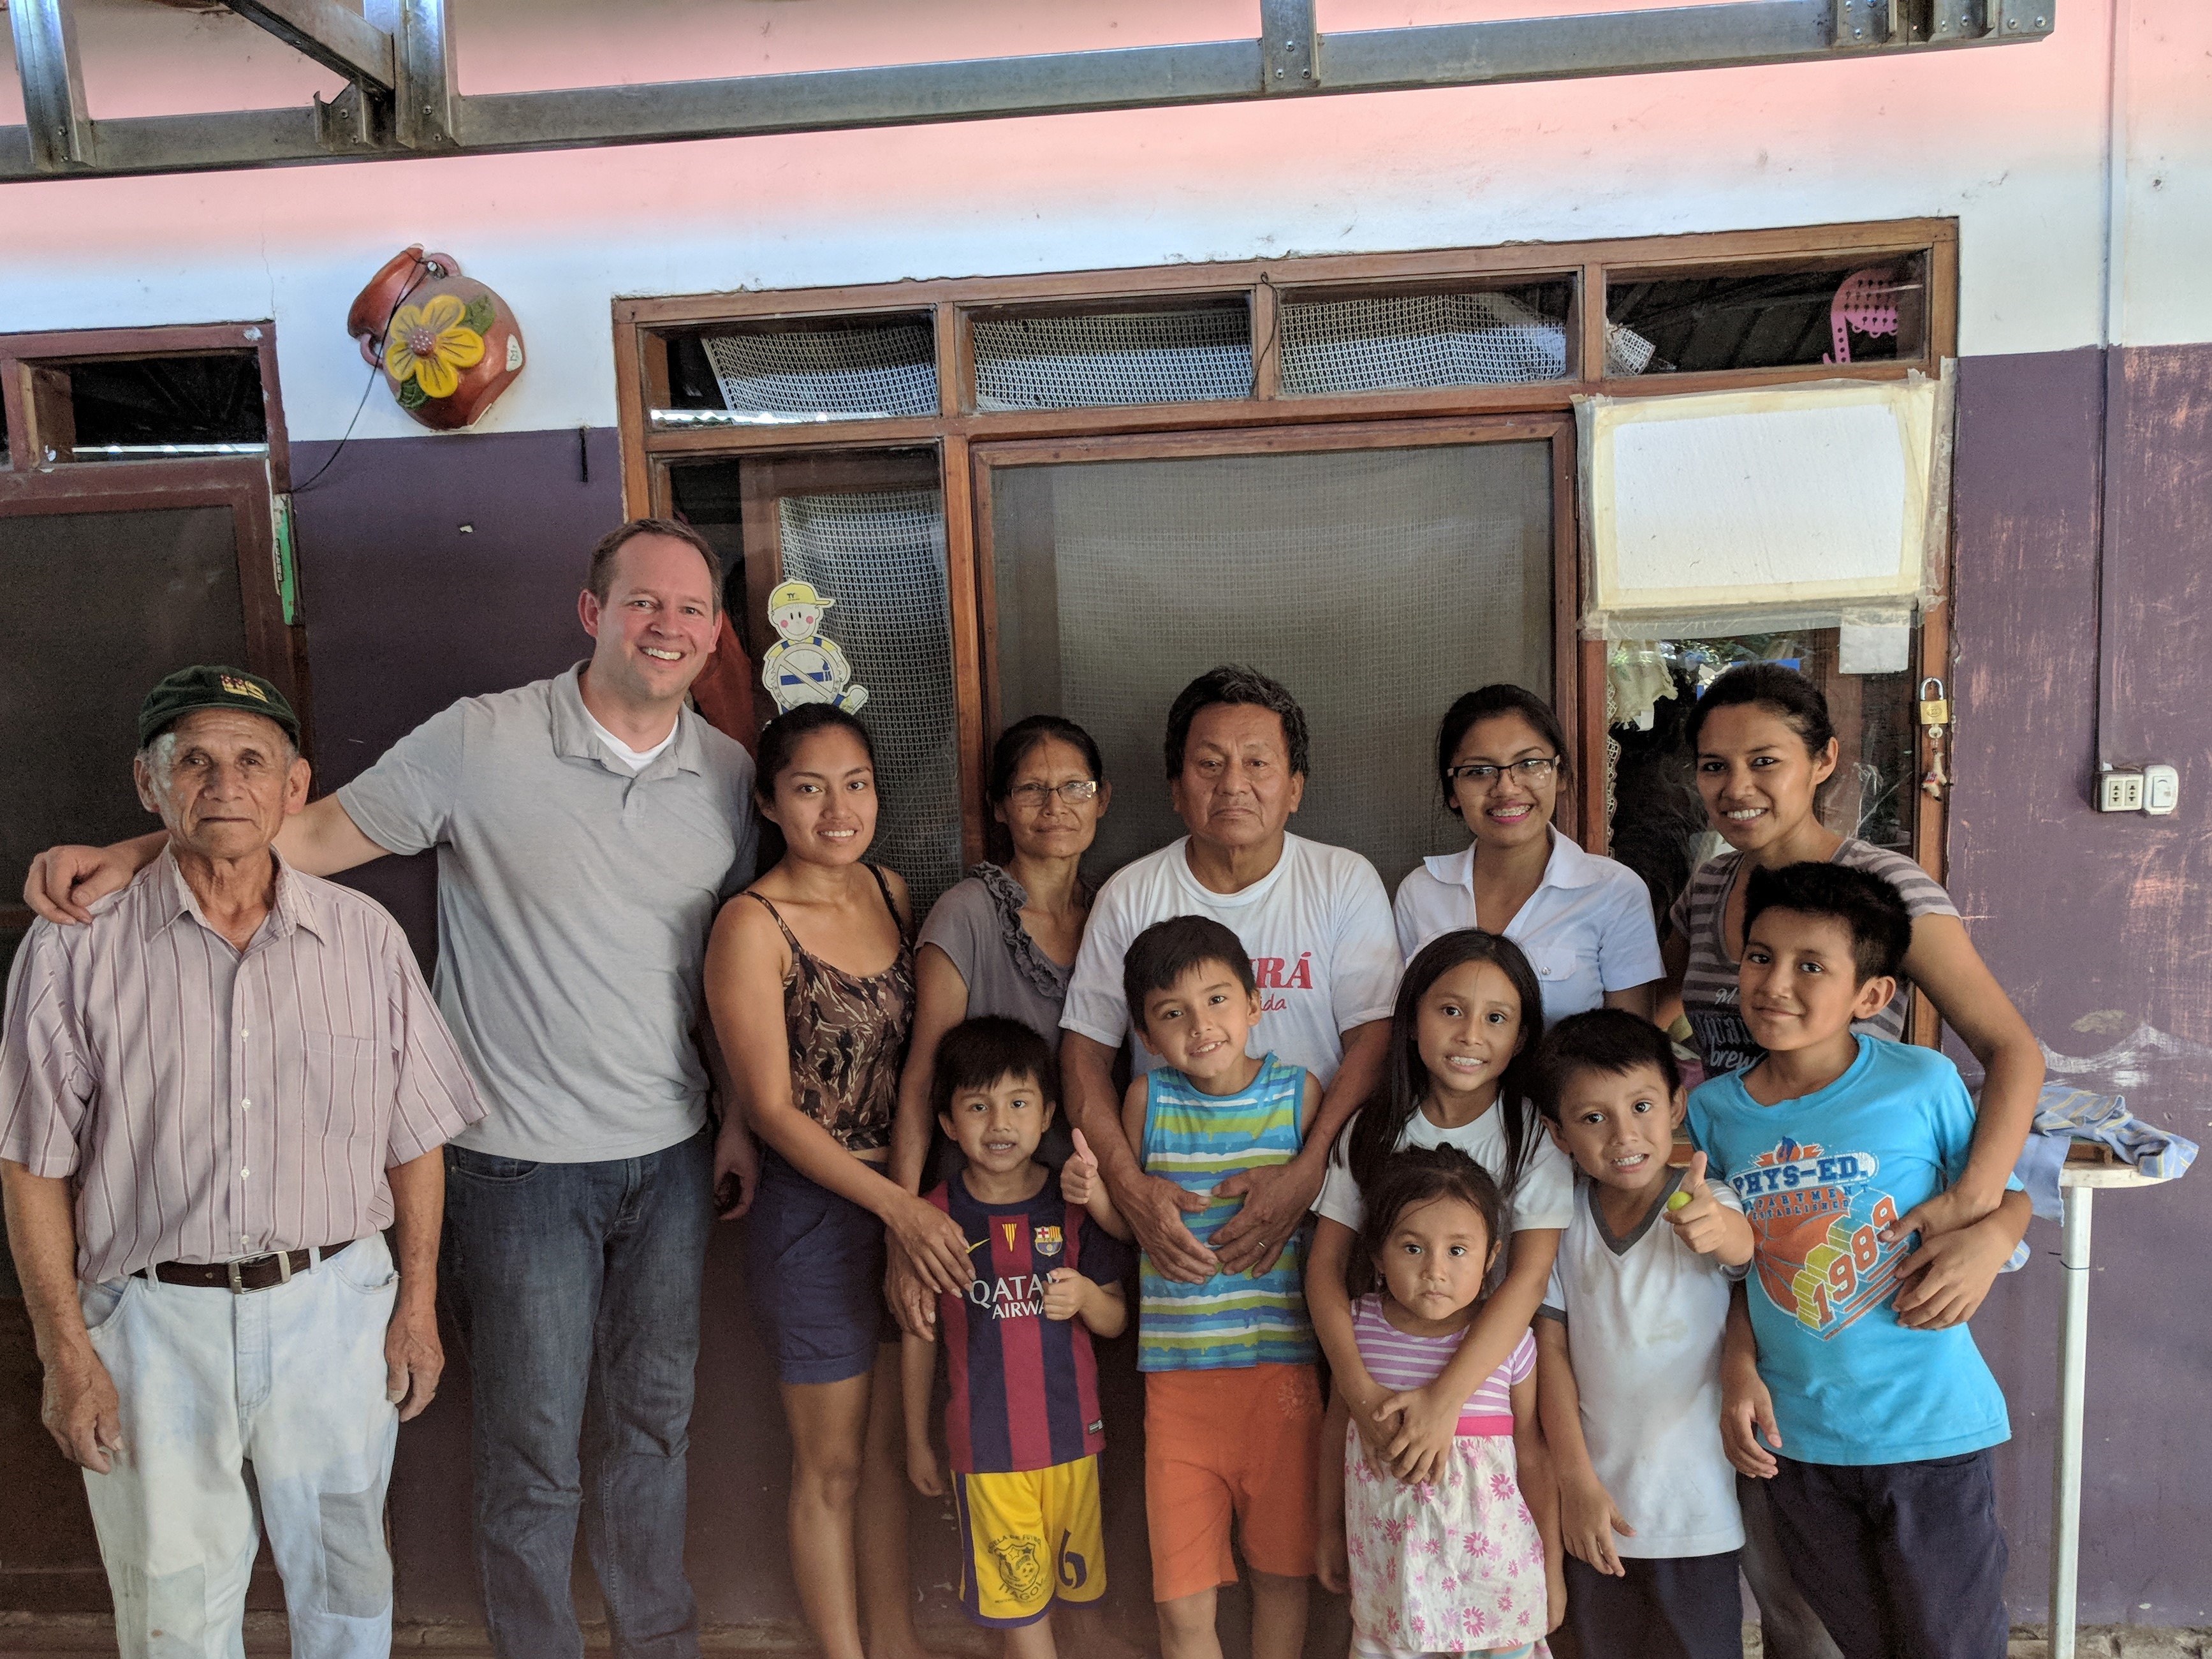 David McConkie with the Antesana family, when they reunited in Montero, Santa Cruz, Bolivia in October.